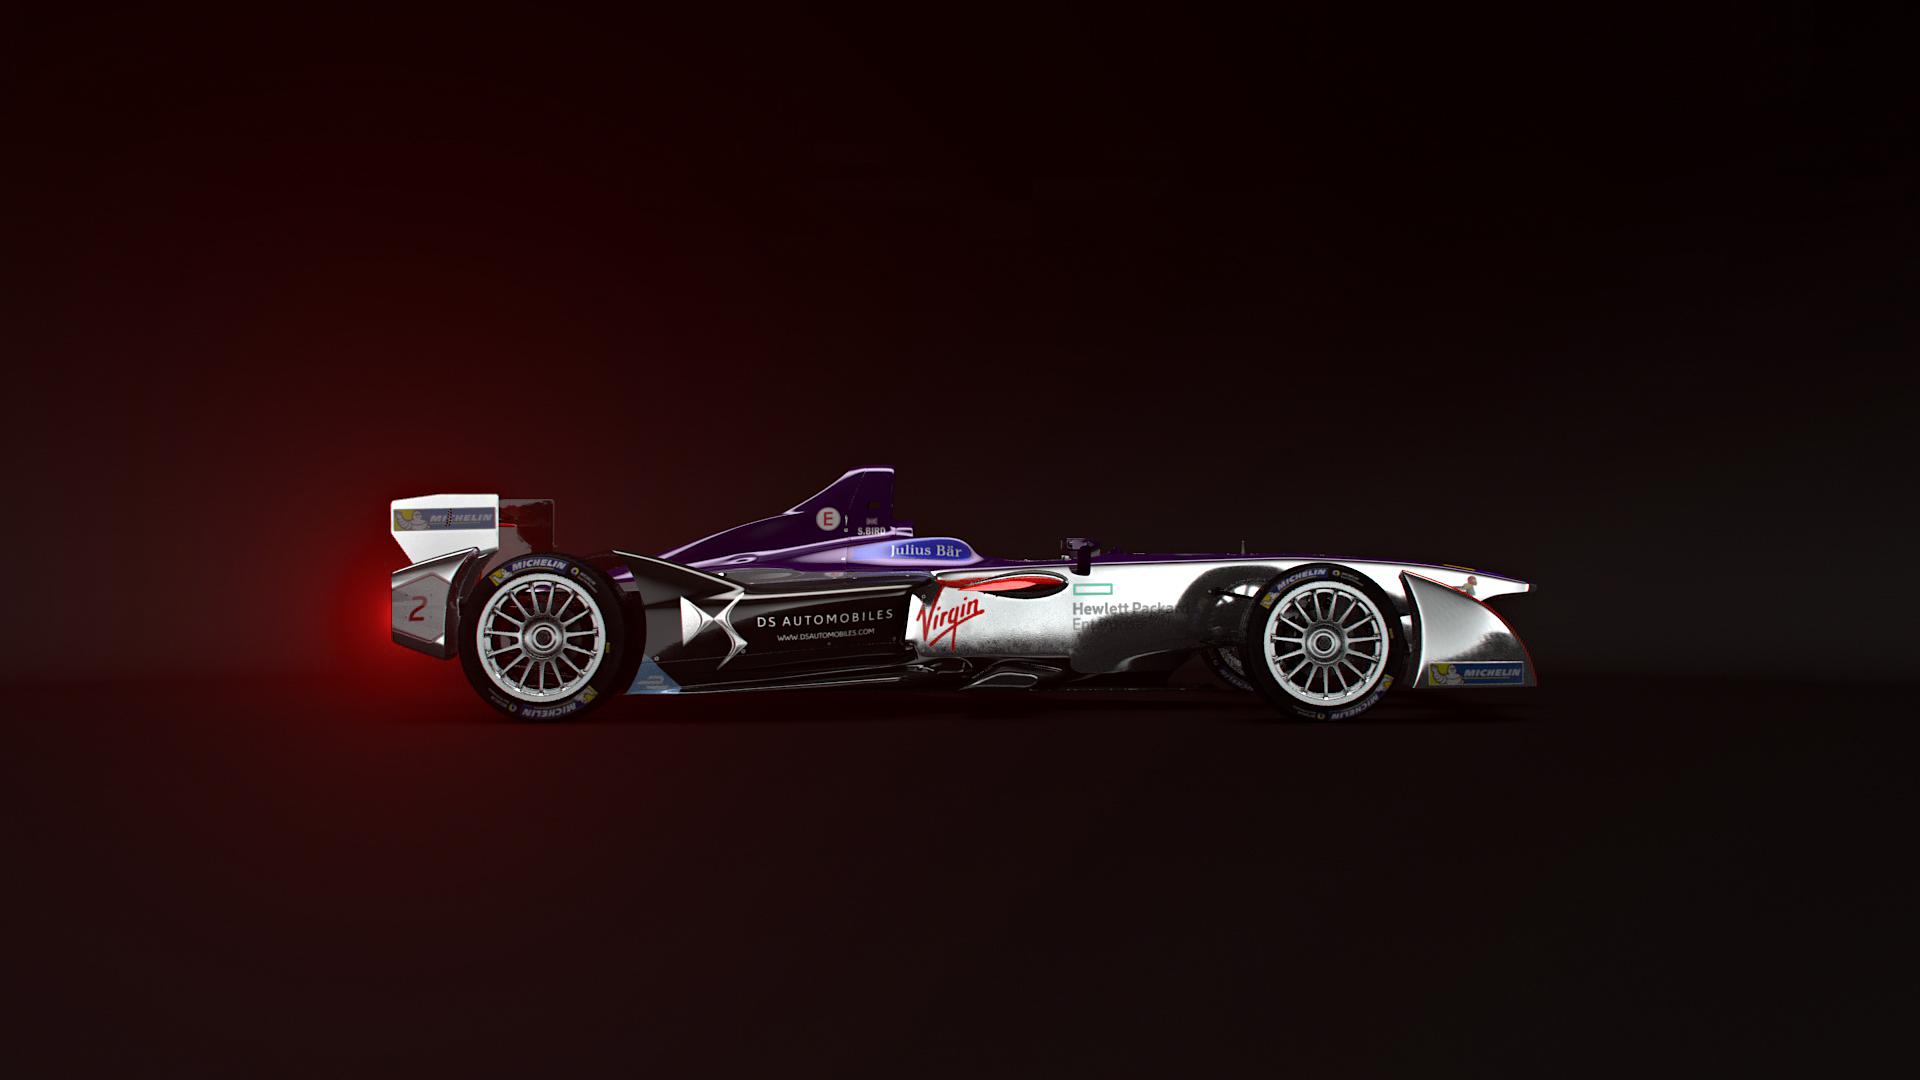 3D render of the DS Automobiles Formula E